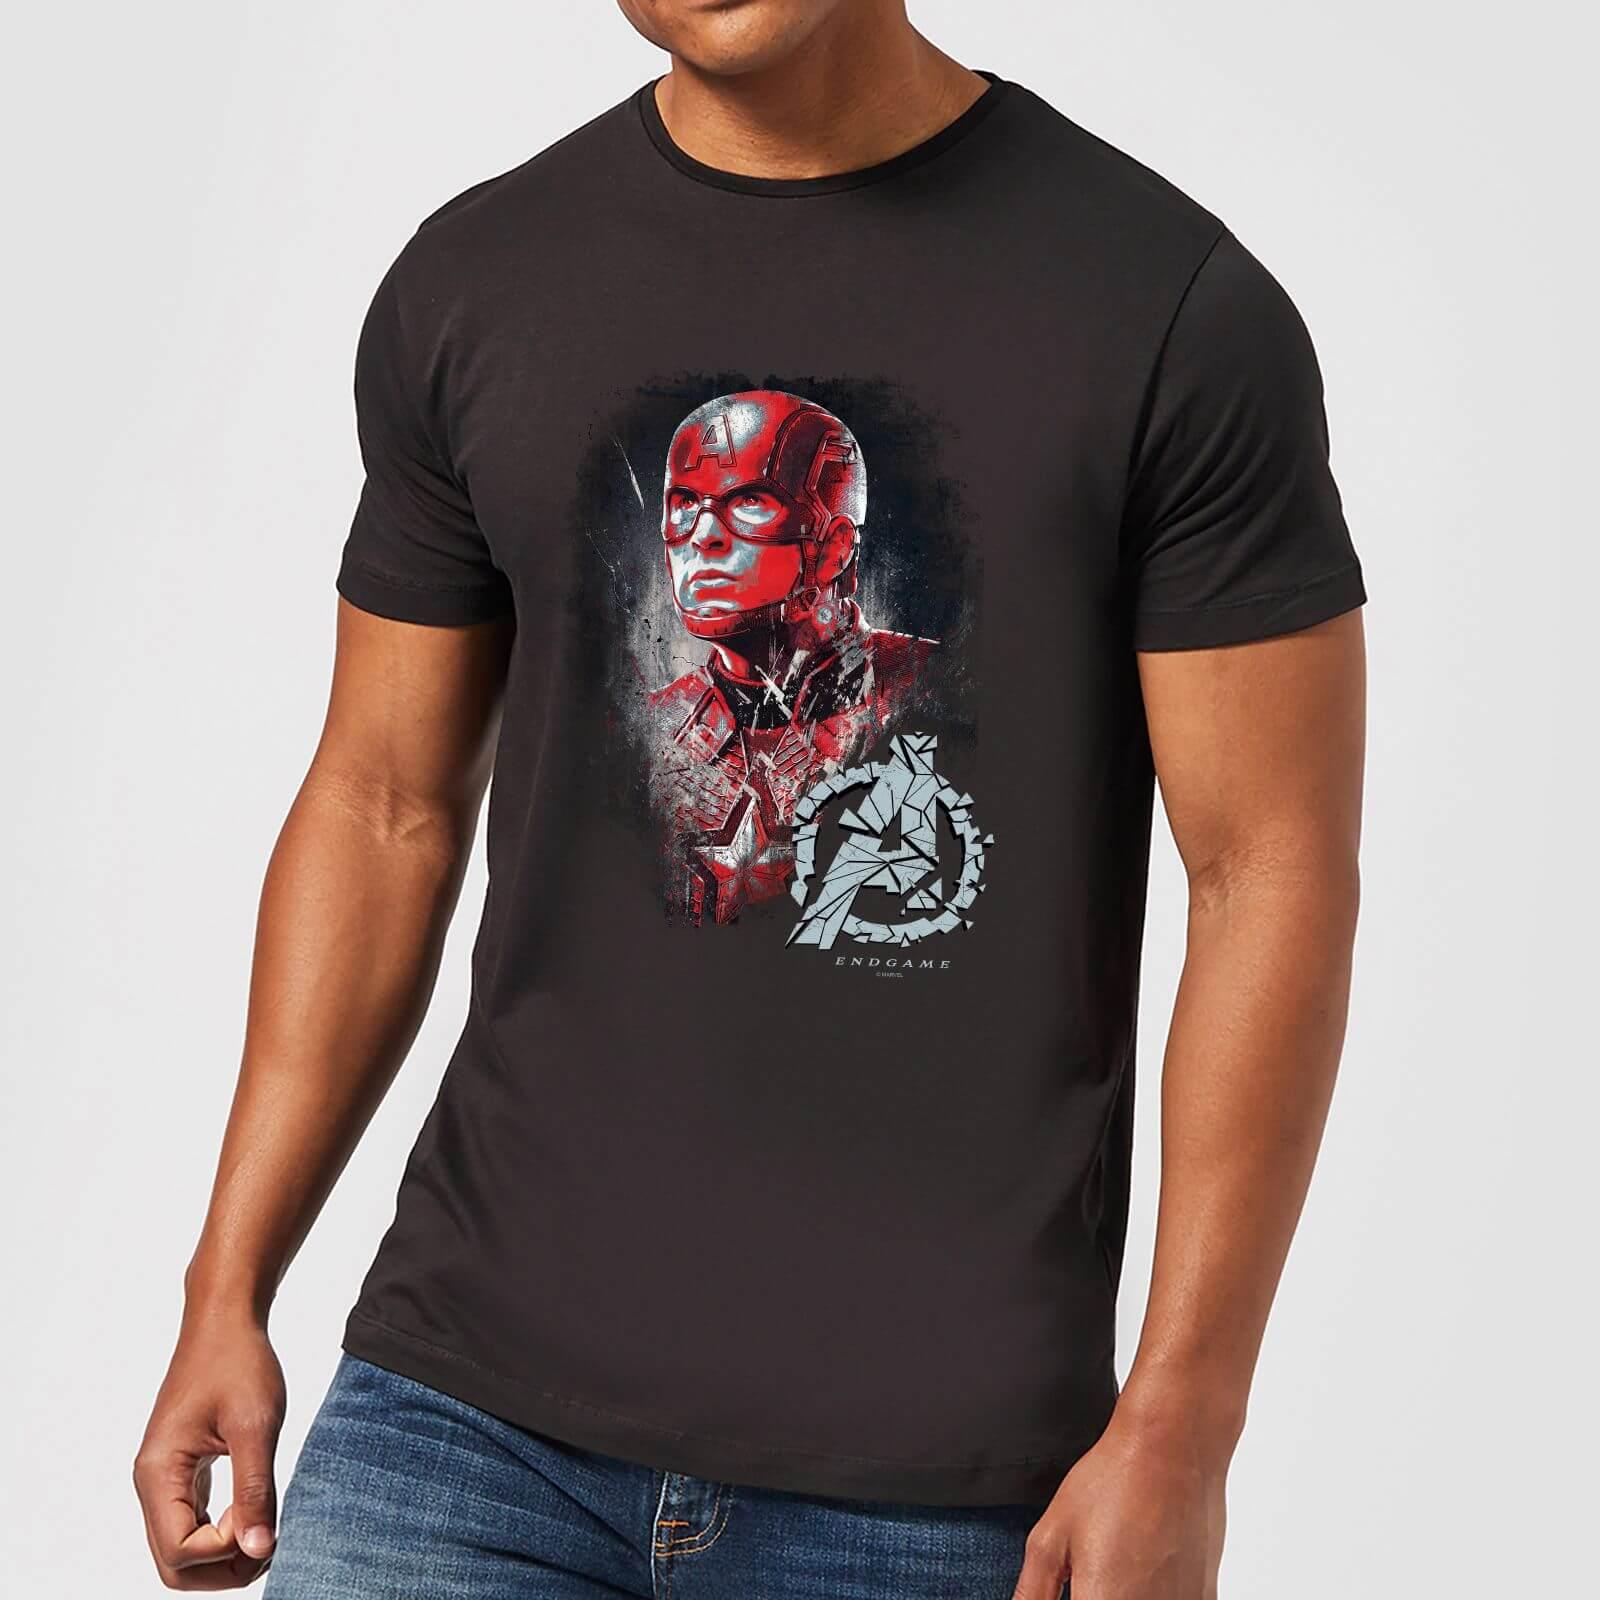 f3ef8fb47d8 Avengers Endgame Captain America Brushed Men's T-Shirt - Black Clothing    Zavvi